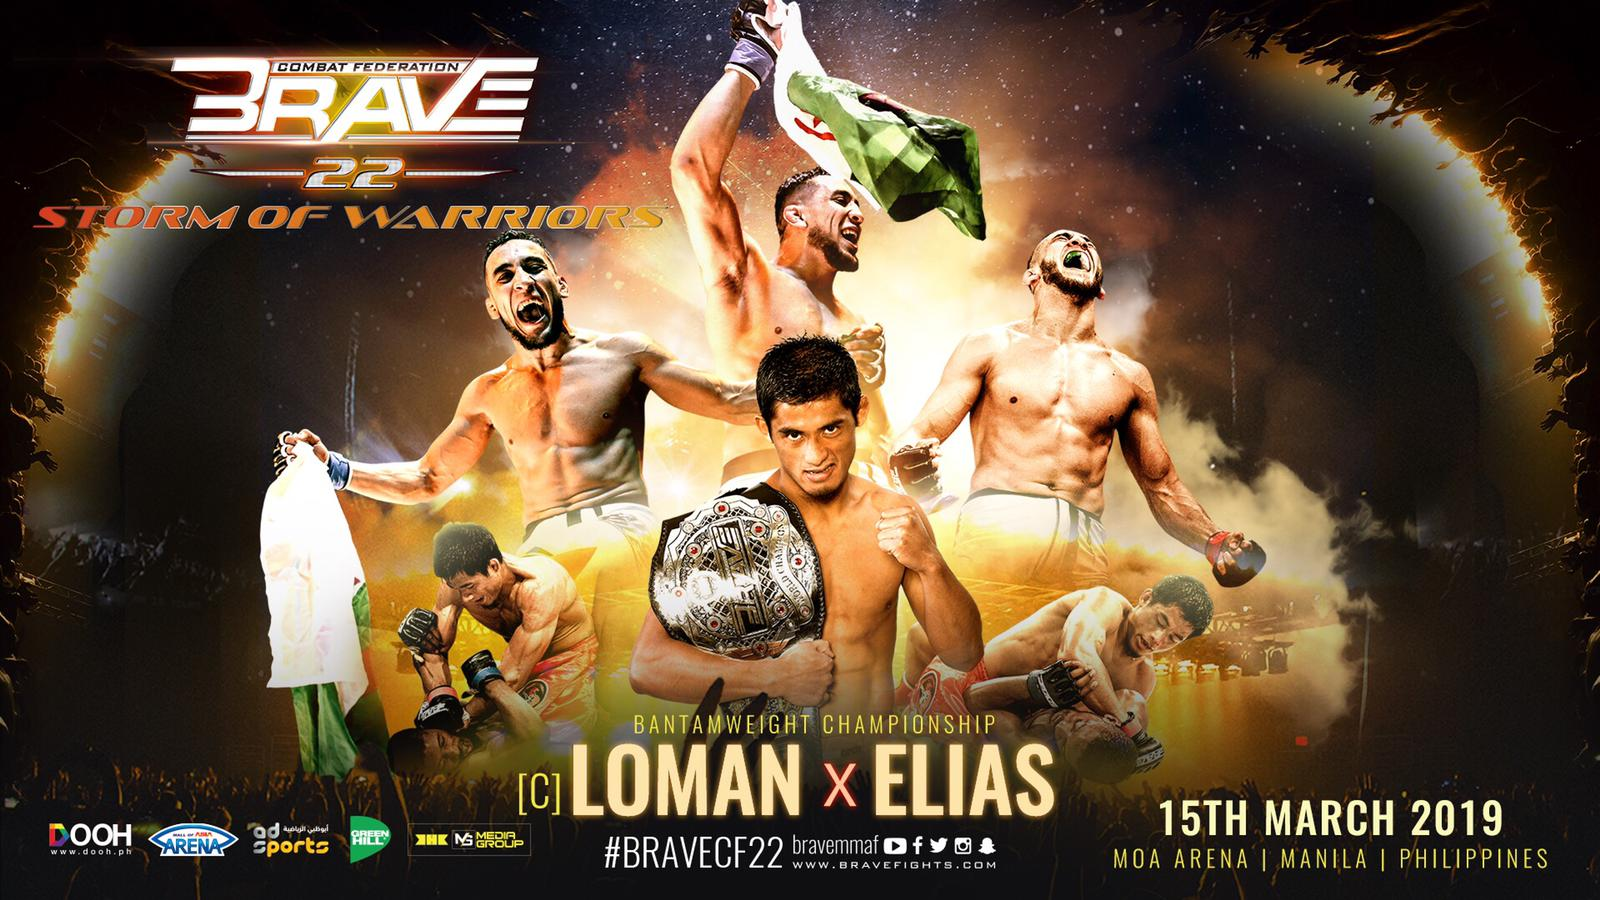 Top fighters predict Brave 22 main event -